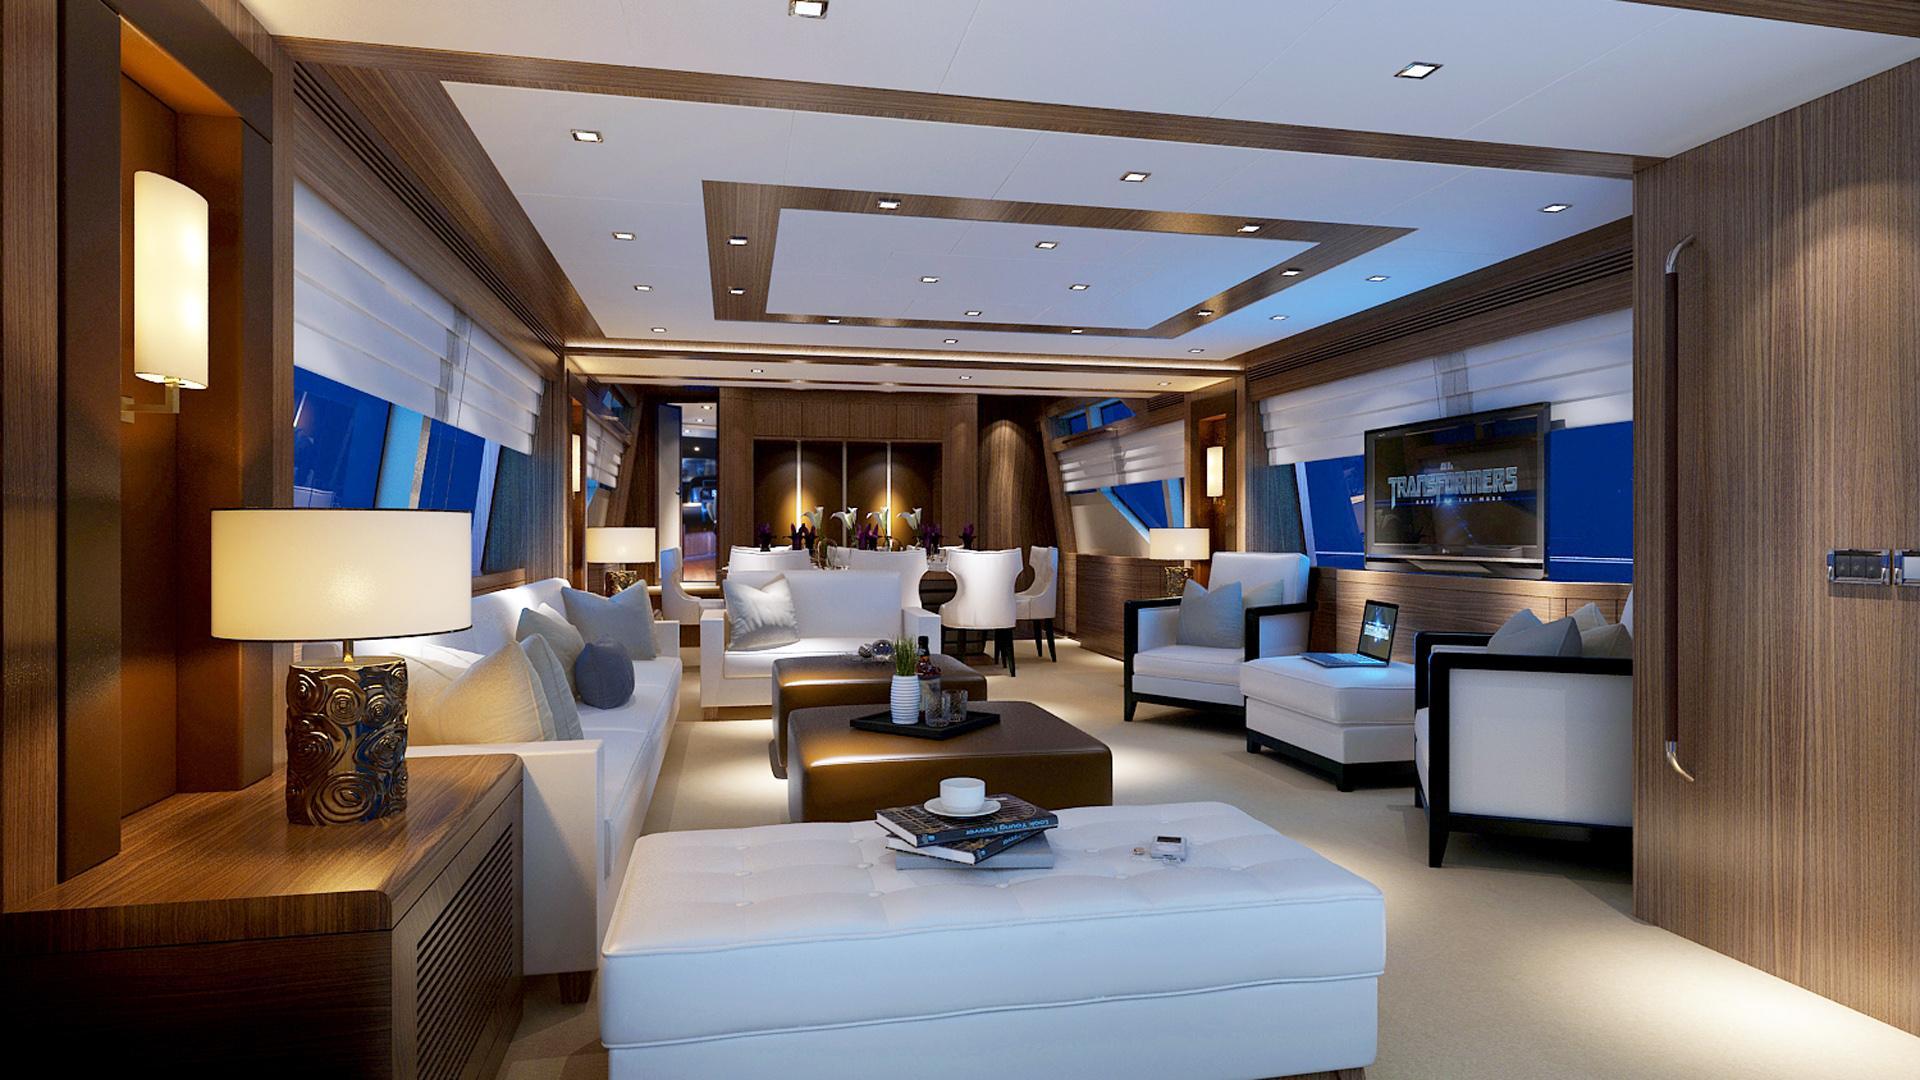 asteria 96 hull 1 motoryacht heysea 29m 2017 lounge